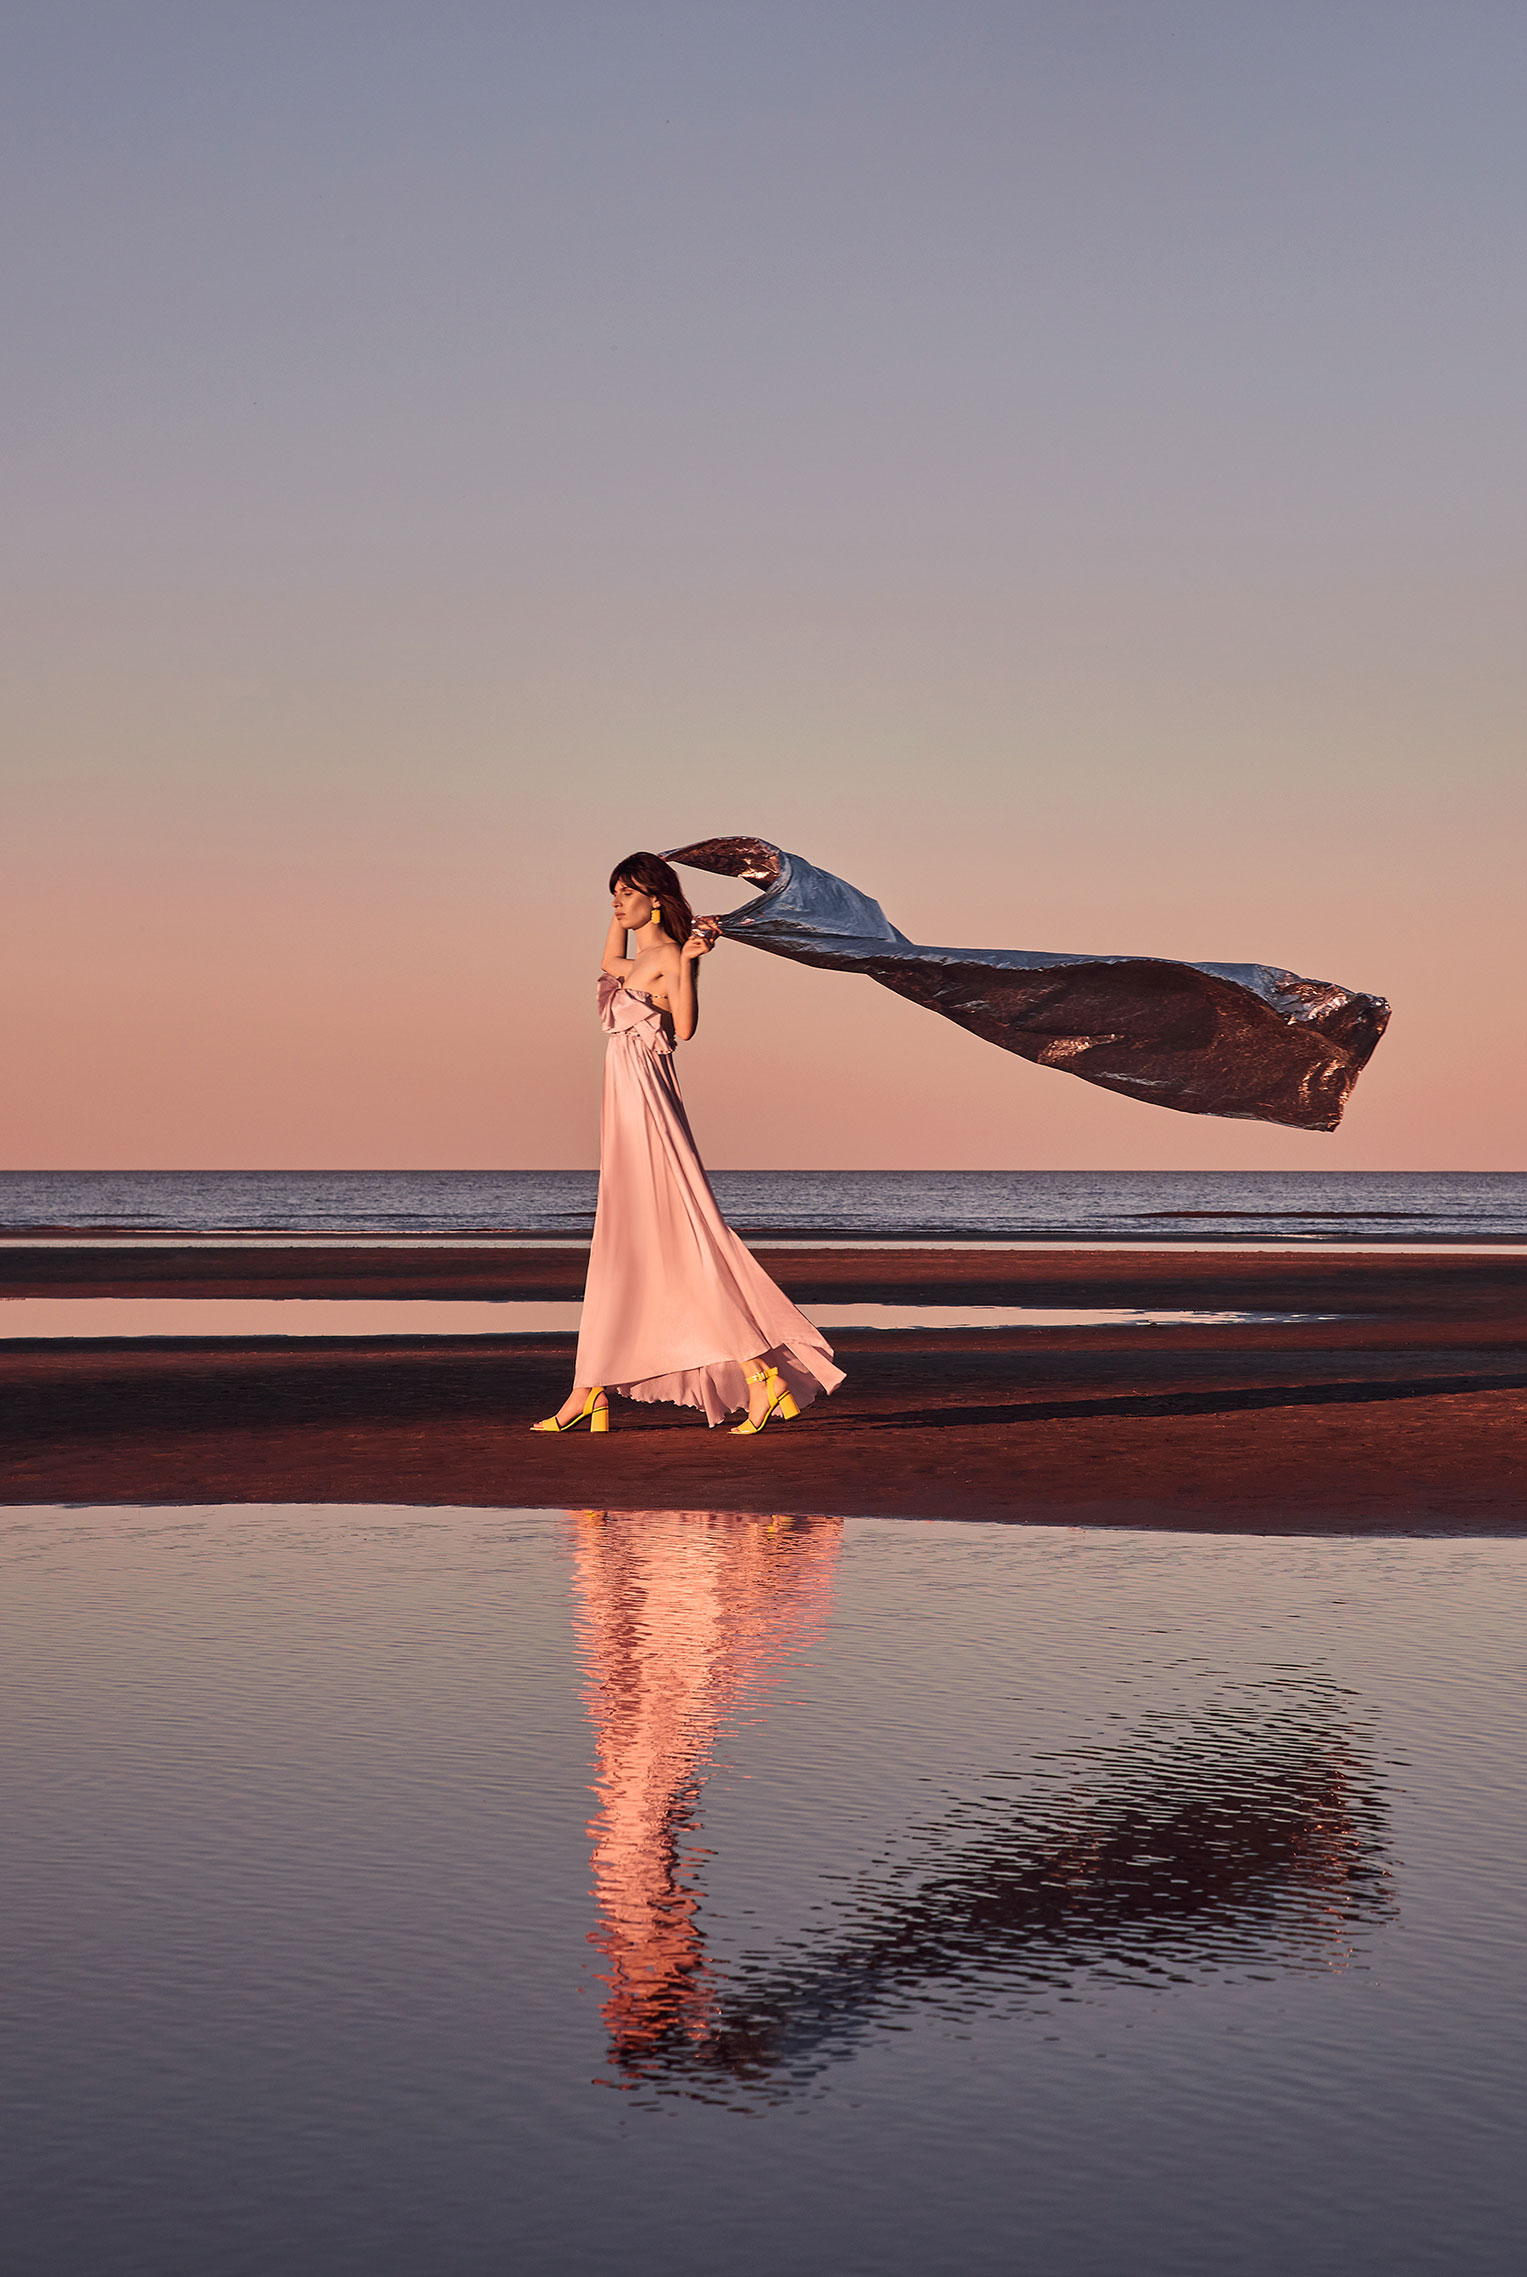 Sabrina Ioffreda by Natasha Ygel / Harper's Bazaar Argentina february 2019